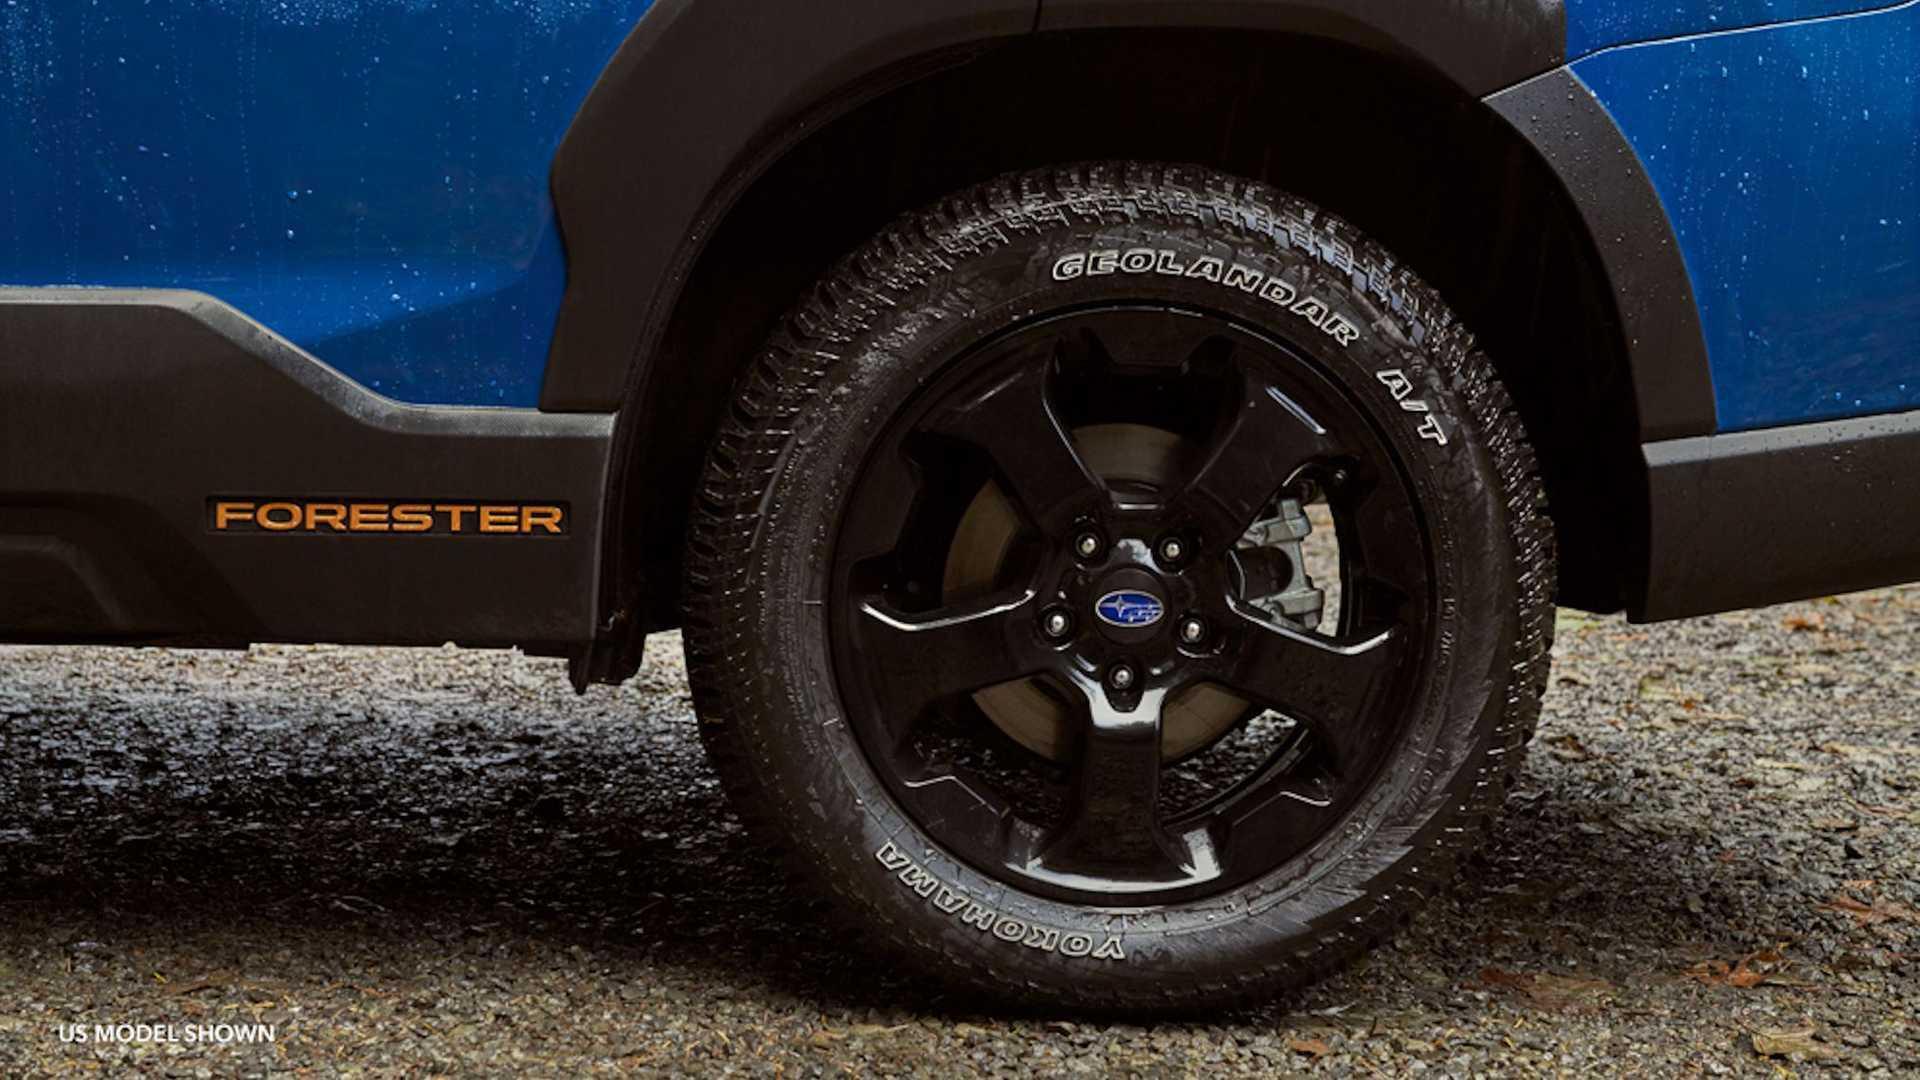 Subaru_Forester_Wilderness_leaked-0003